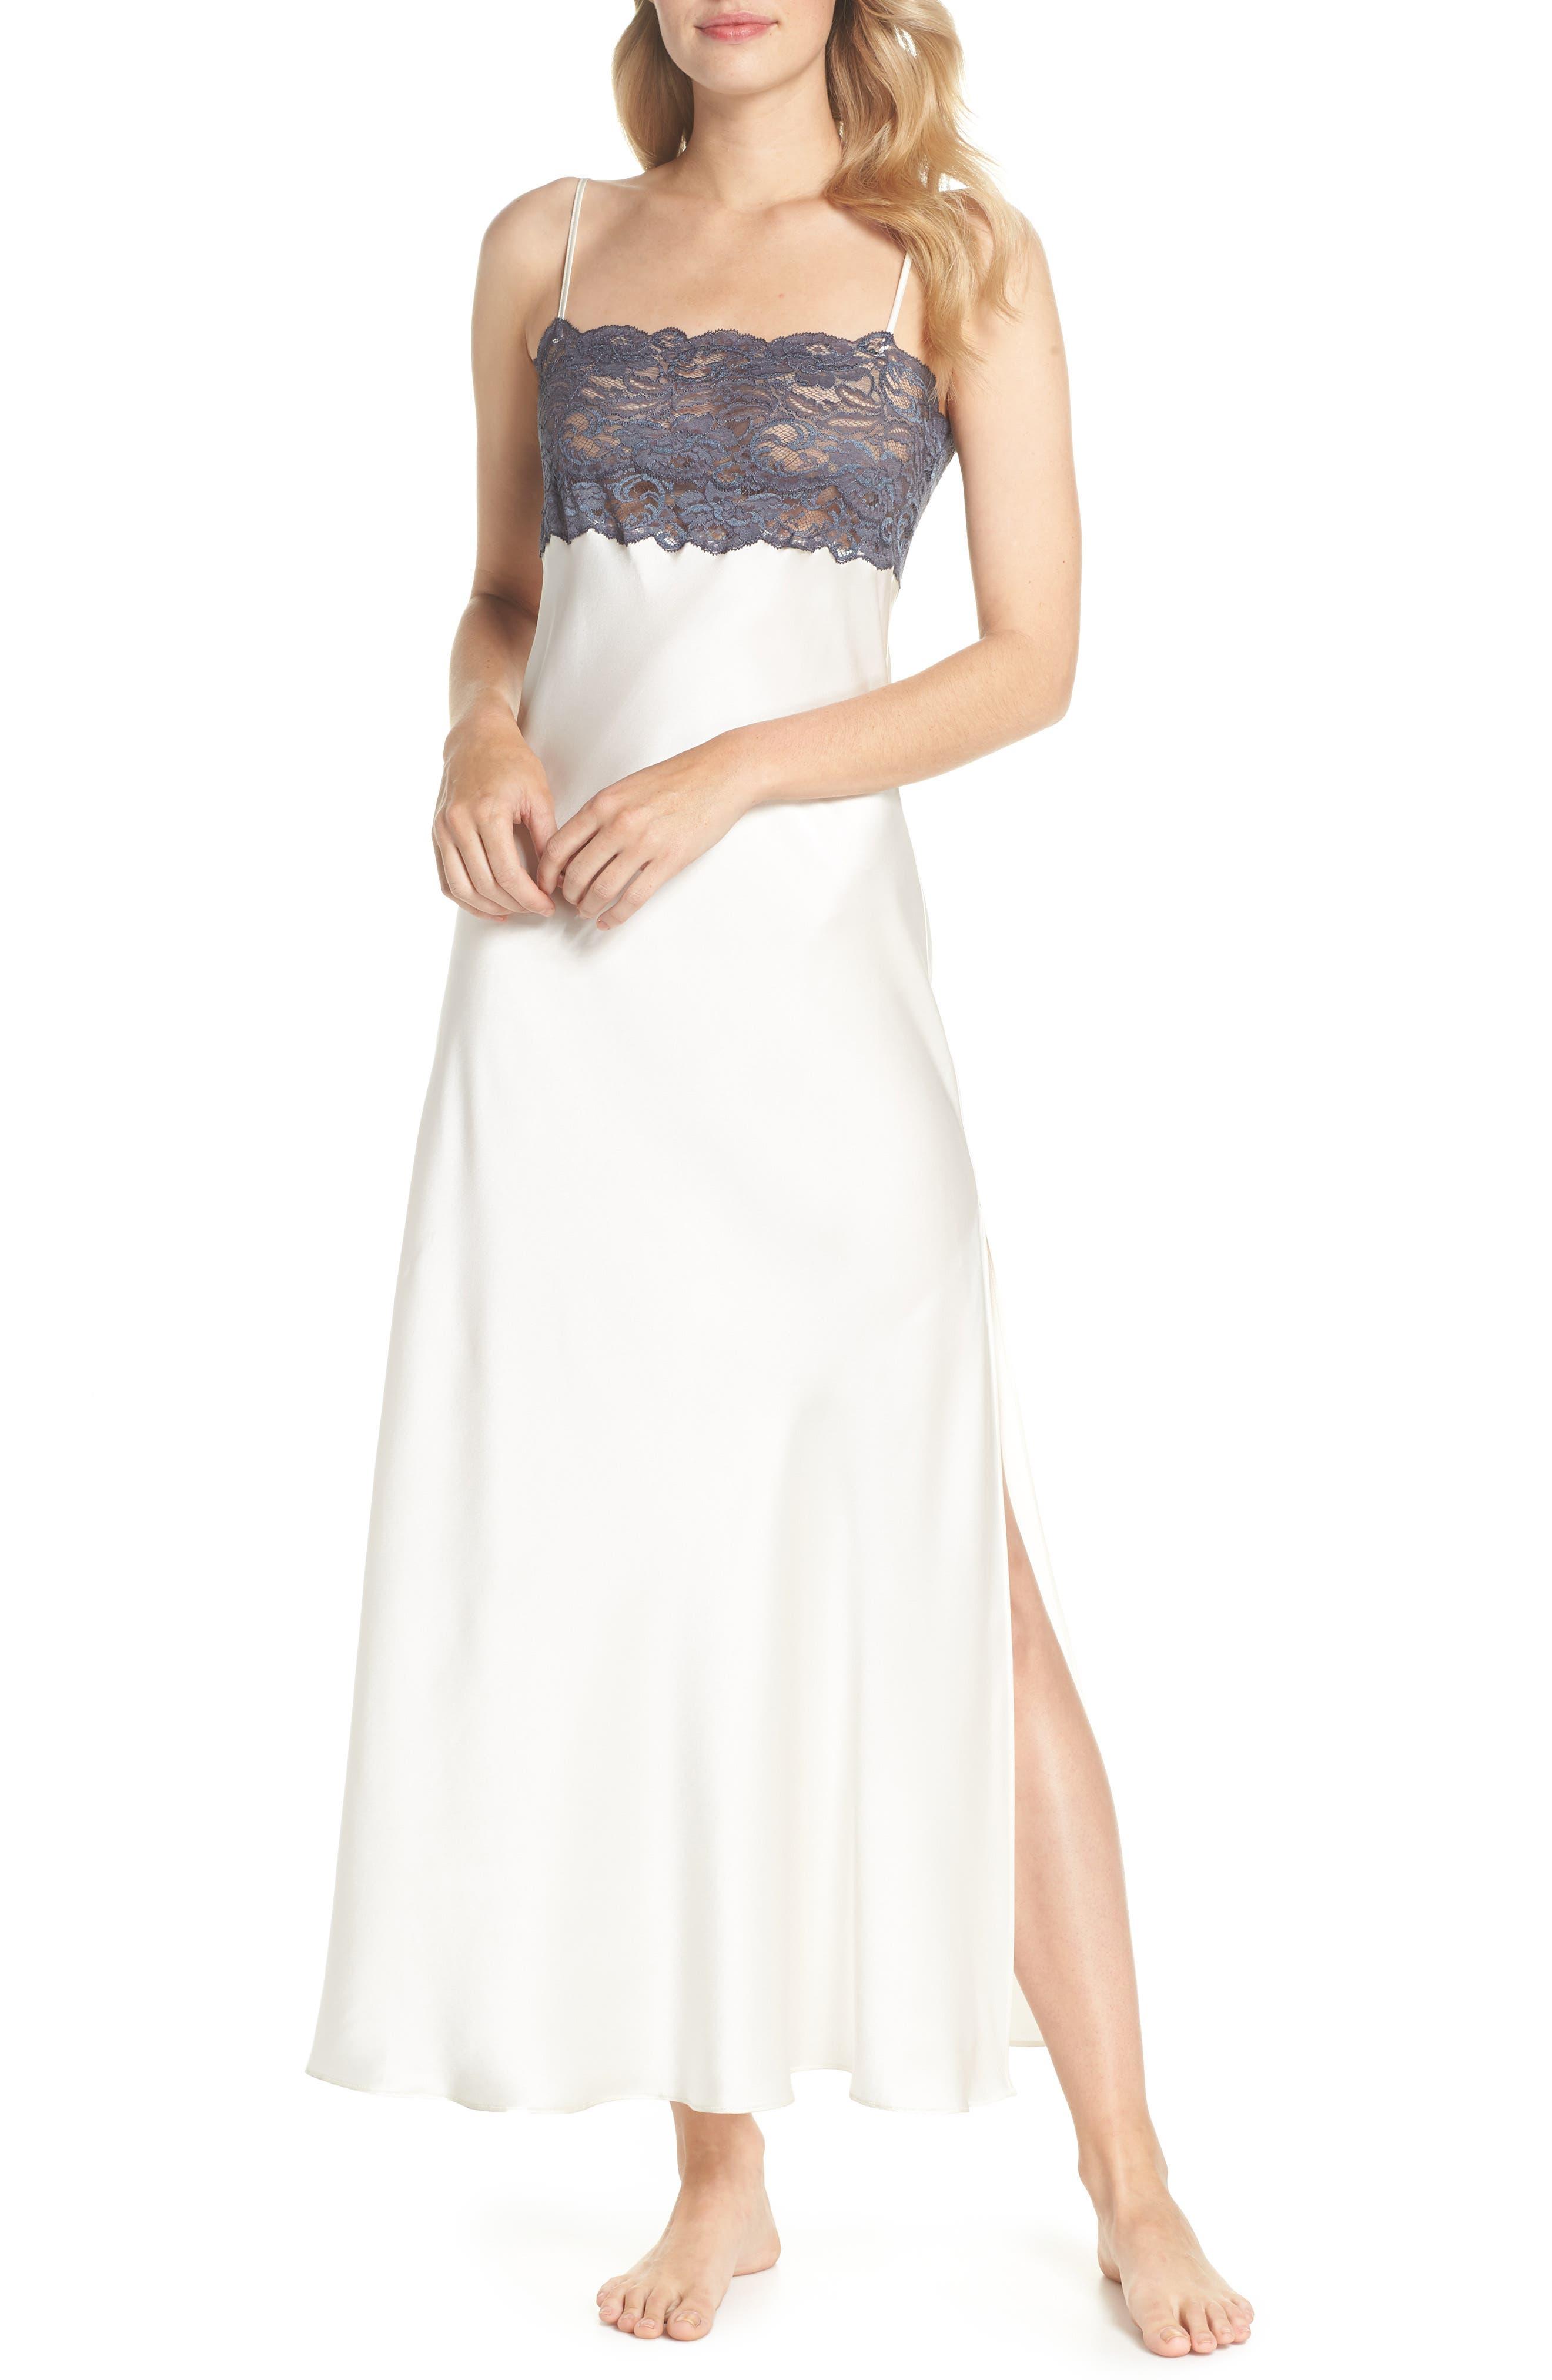 Christine Stretch Lace Silk Nightgown